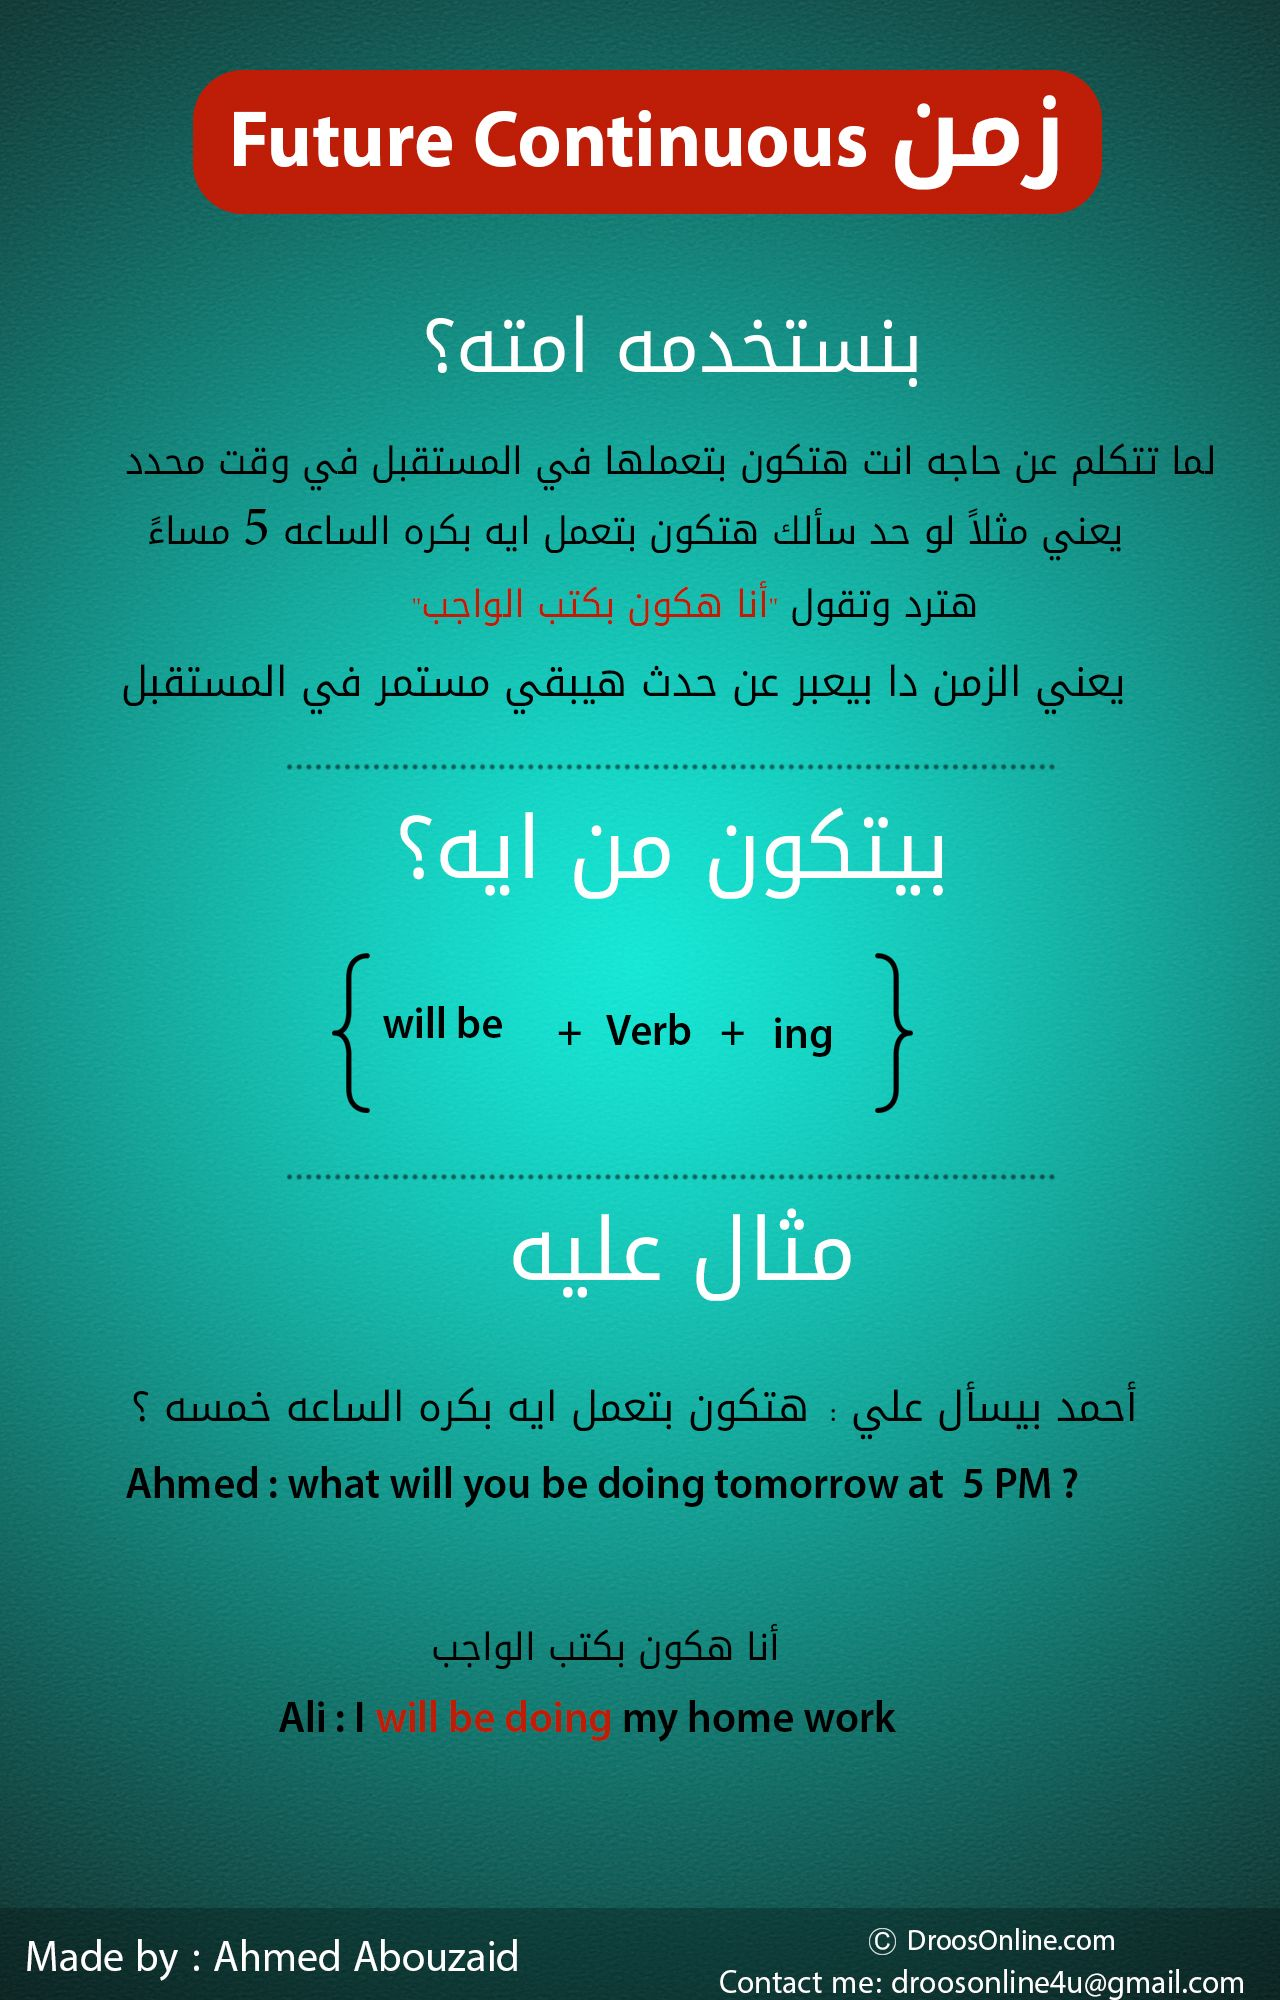 Pin By Adel Almoghir On الافعال في اللغة الانجليزية English Language Learning Grammar English Language Teaching English Language Learning